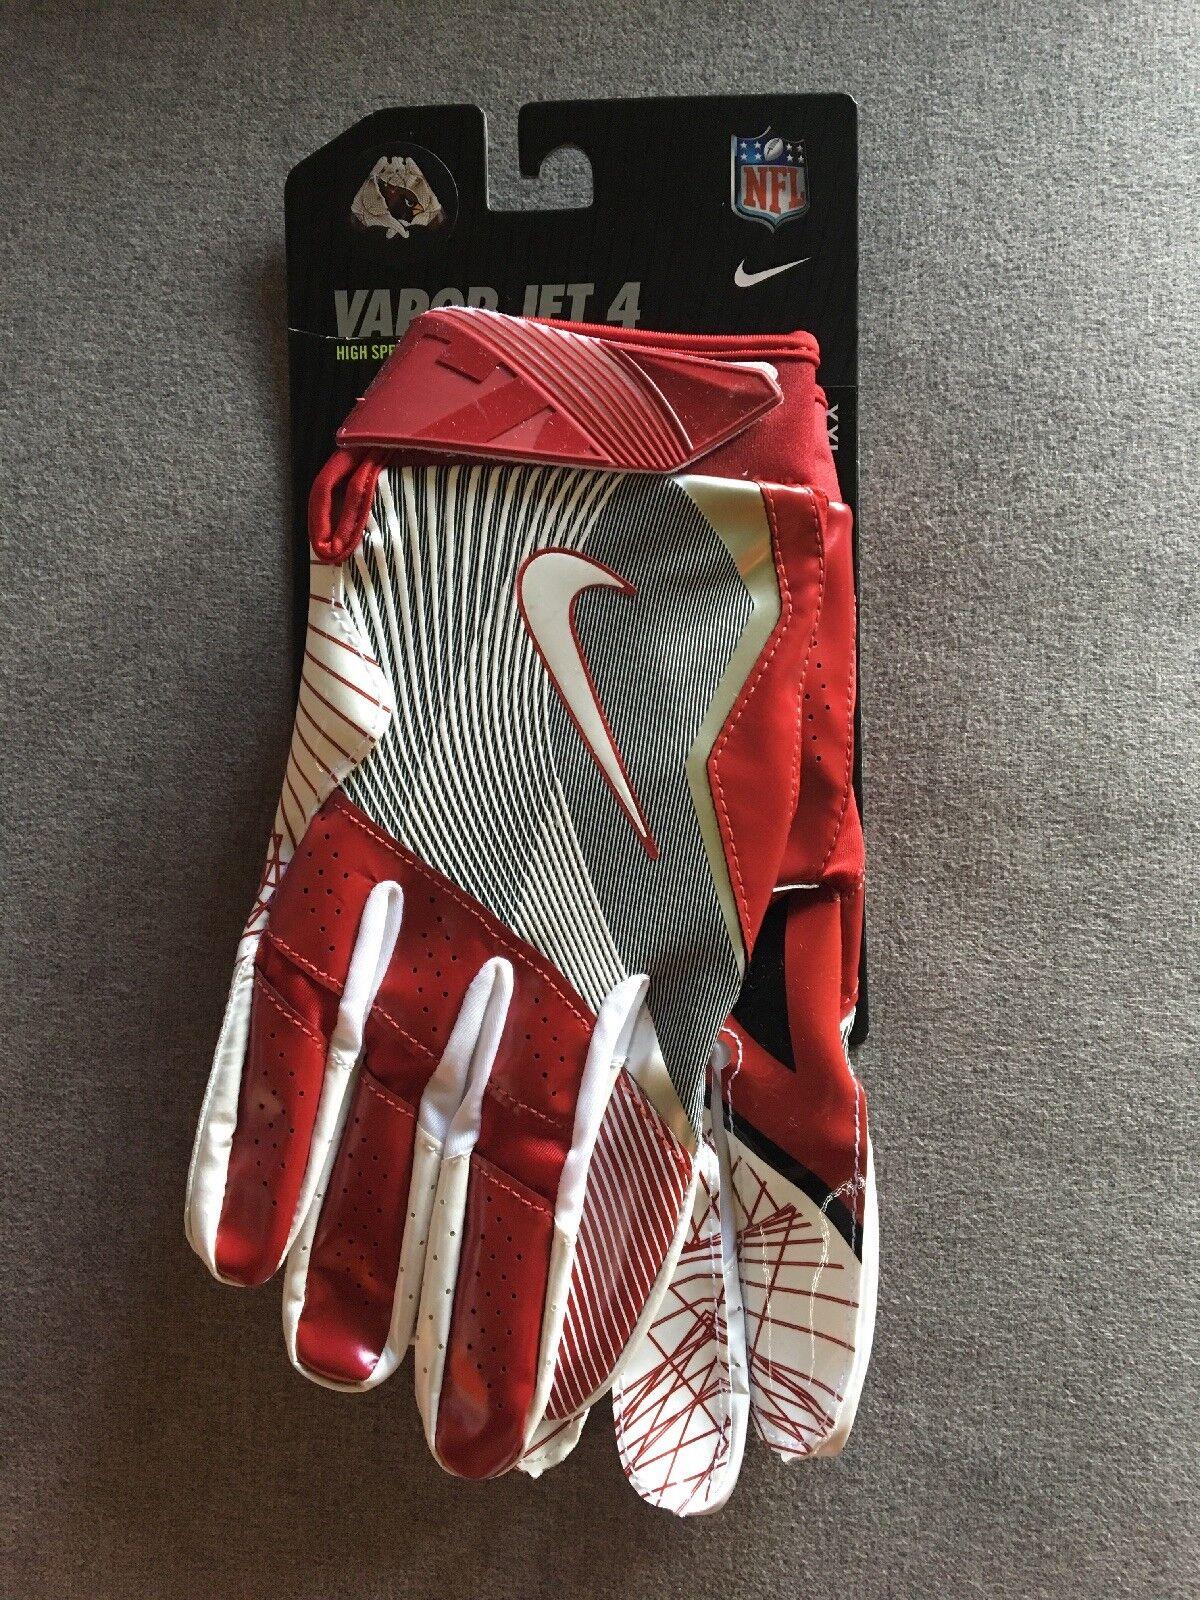 Men S Nike Vapor Jet 4 Nfl Arizona Cardinals Football Gloves Xxl 2xl For Sale Online Ebay